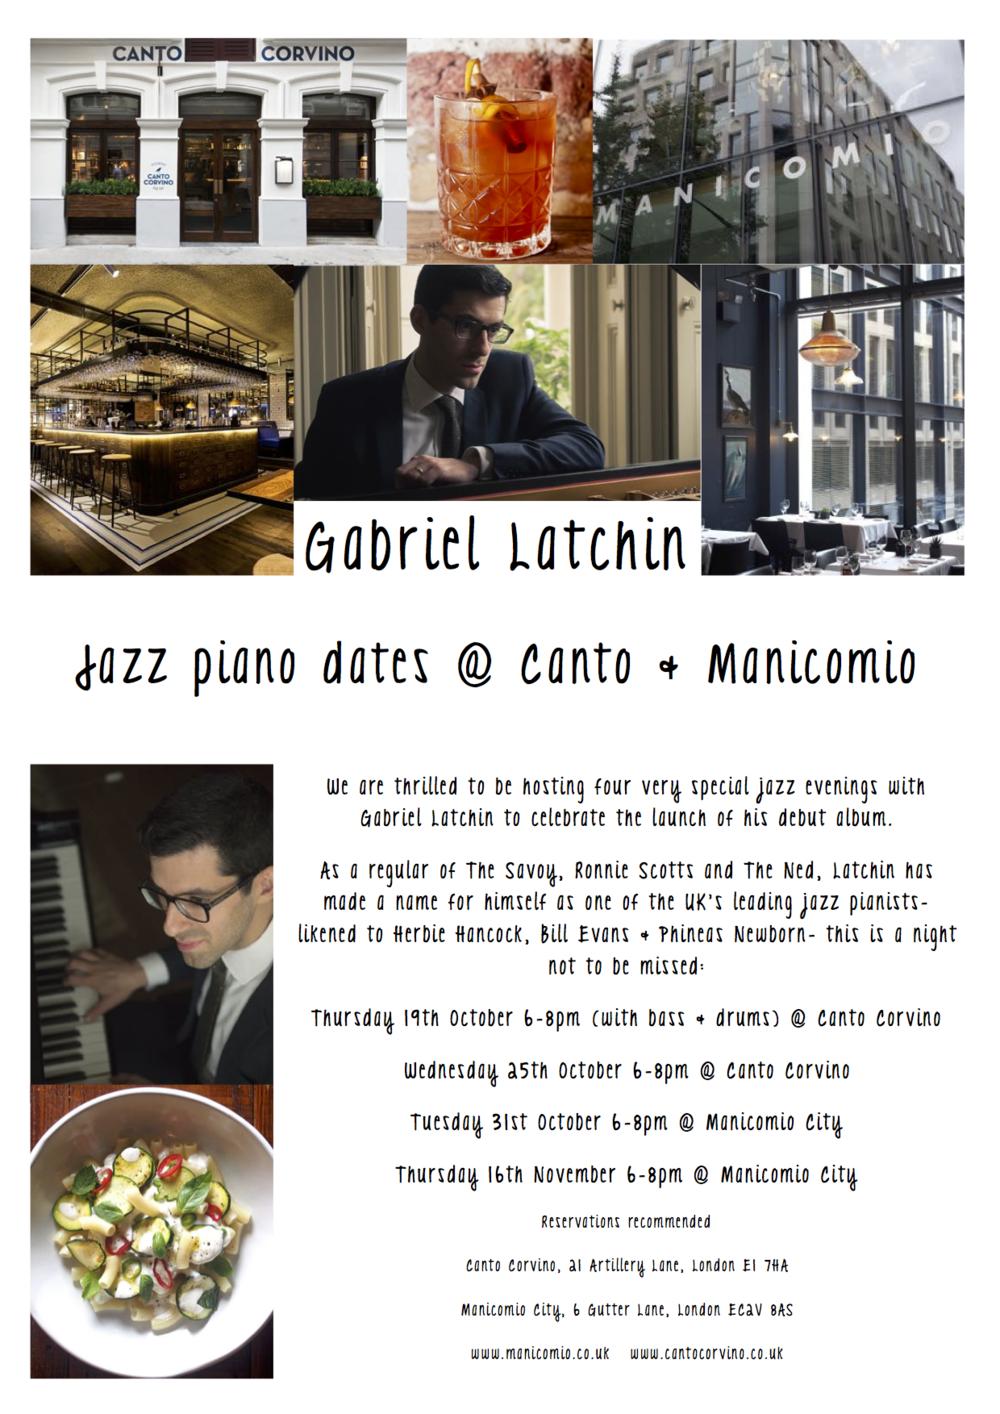 Gabriel Latchin Canto and Malfatti ad 051017 copy2 pdf.png